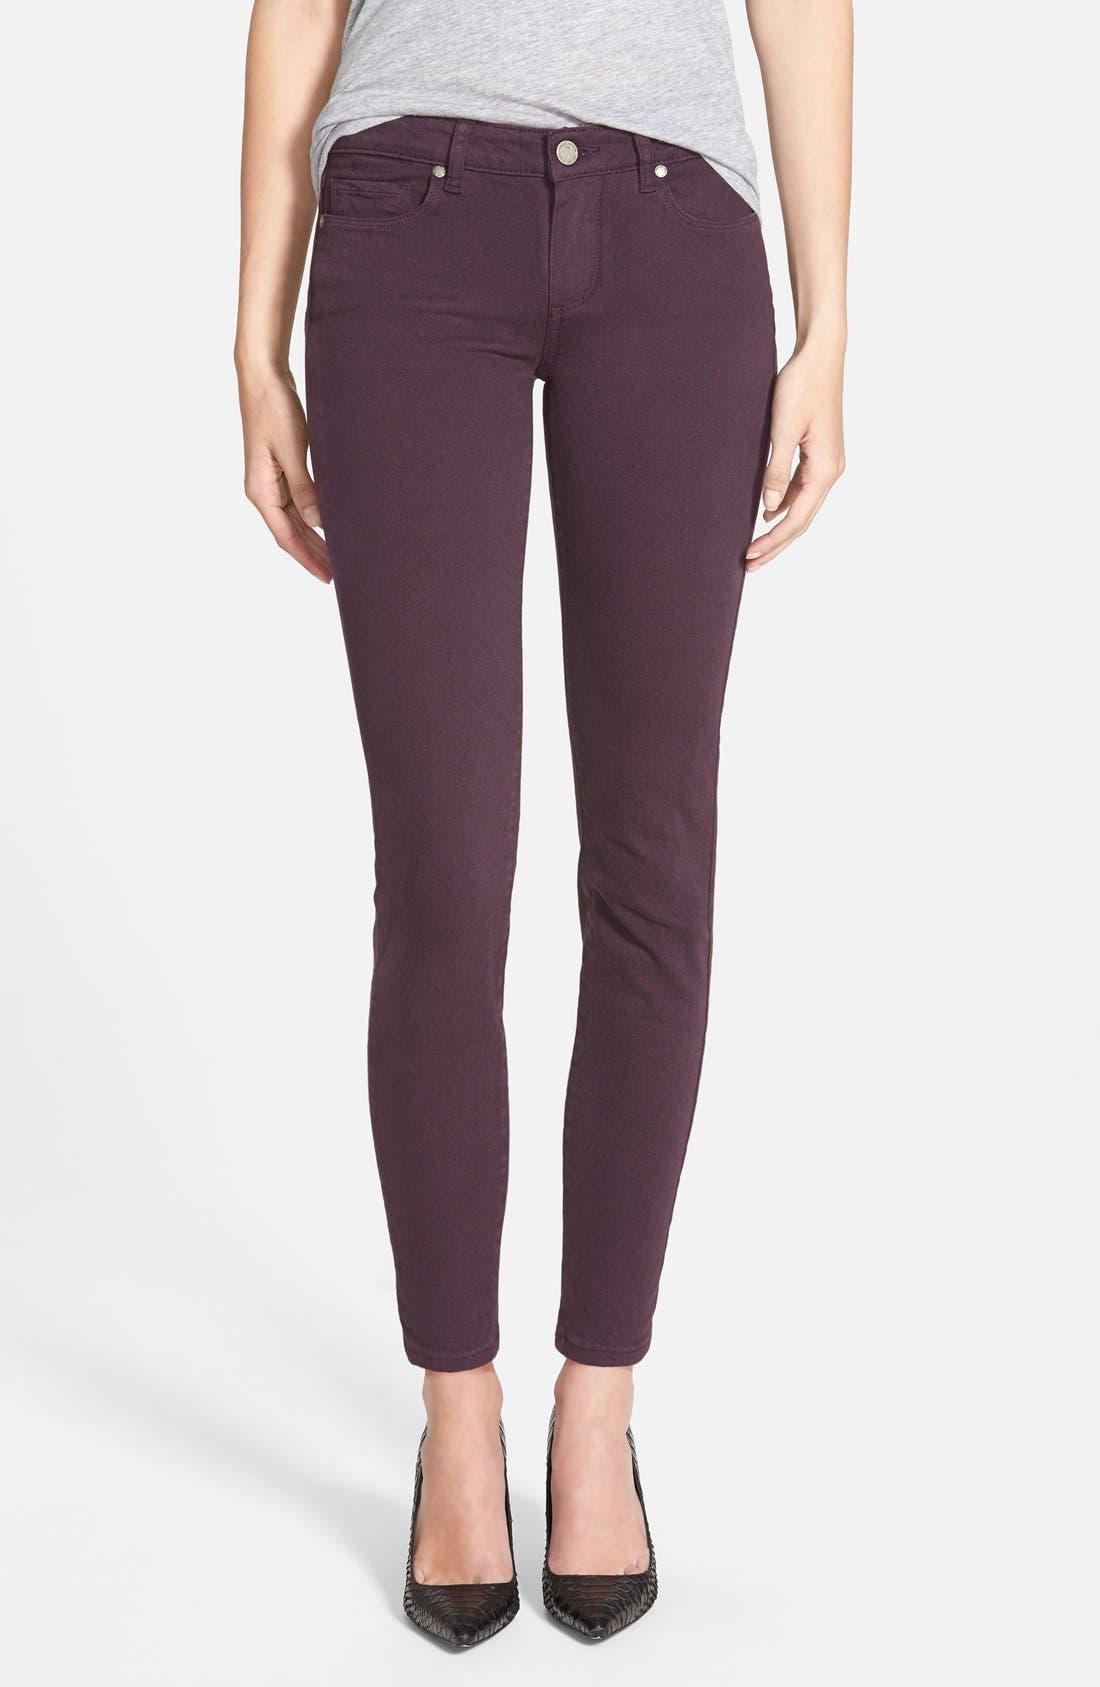 Alternate Image 1 Selected - Paige Denim 'Verdugo' Ankle Skinny Jeans (Autumn Plum) (Nordstrom Exclusive)